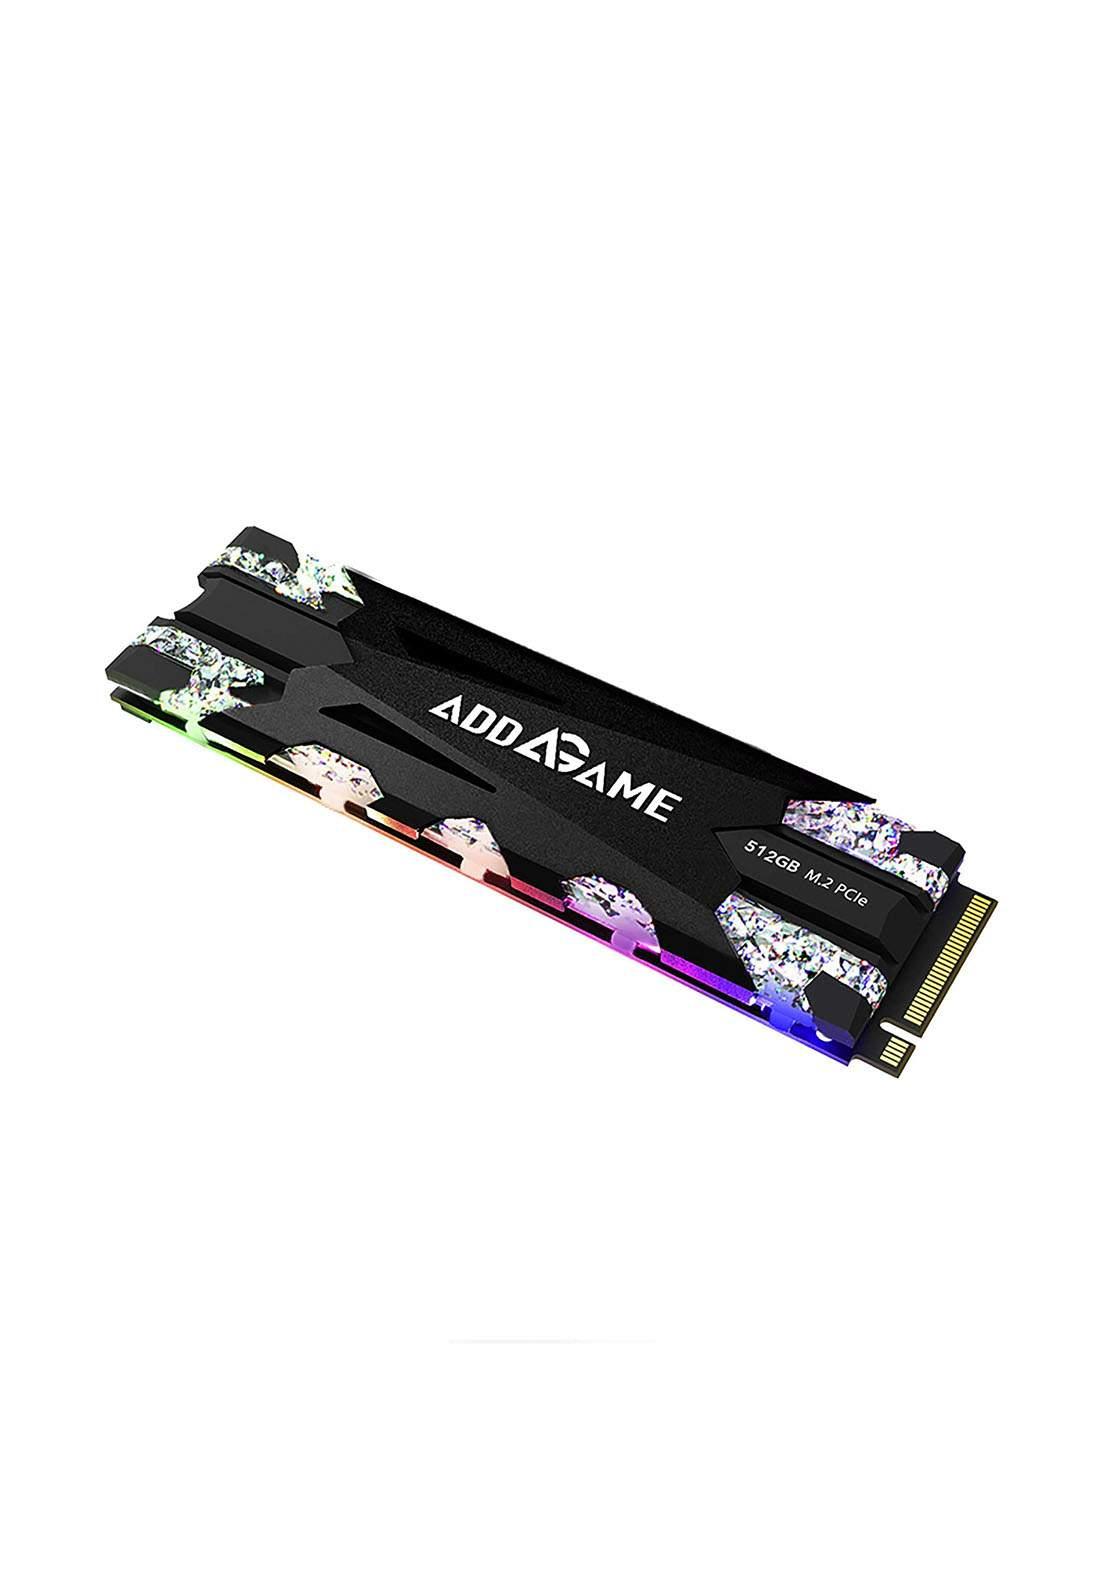 Addlink X70 512GB RGB With Heatsink NVMe PCIe Gen 3x4 Internal SSD هارد داخلي